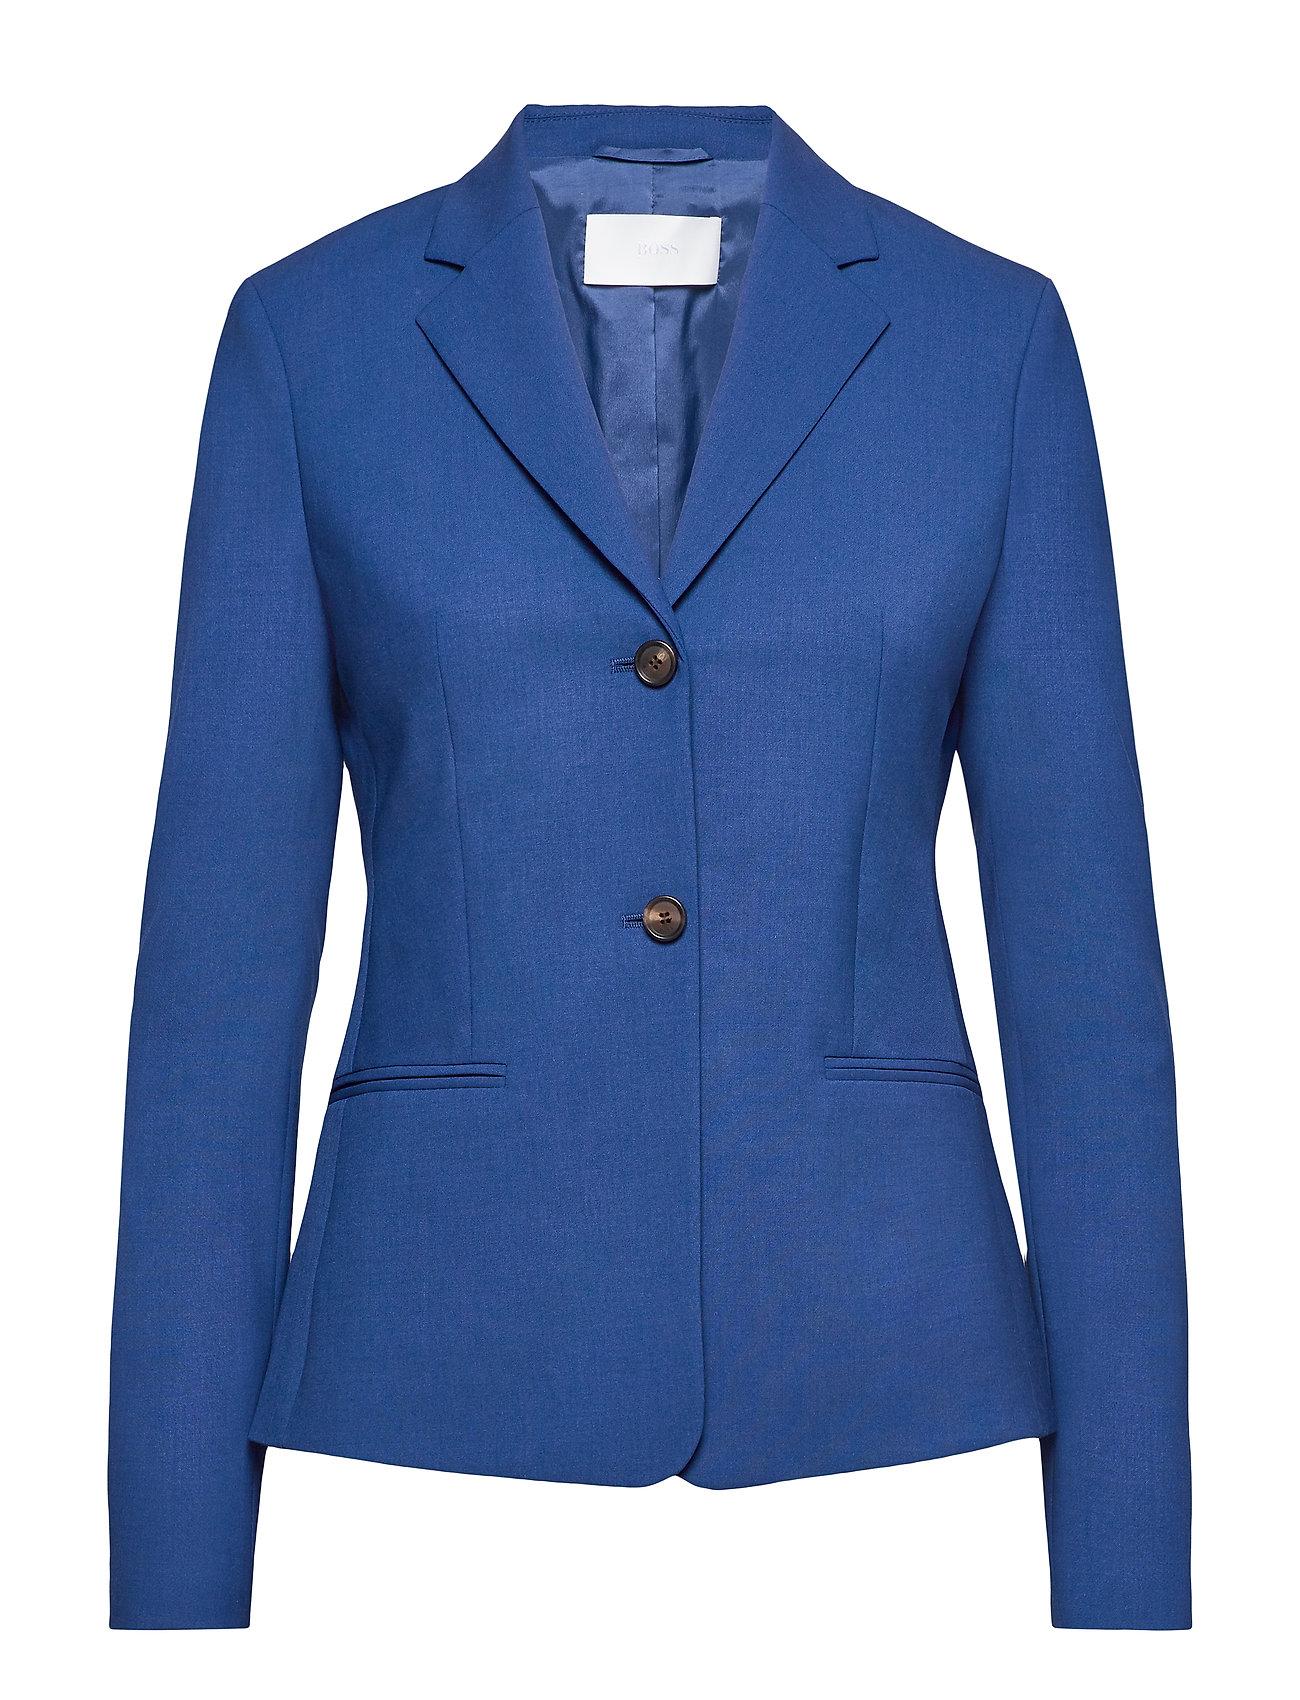 BOSS Business Wear Jatinda2 - MEDIUM BLUE